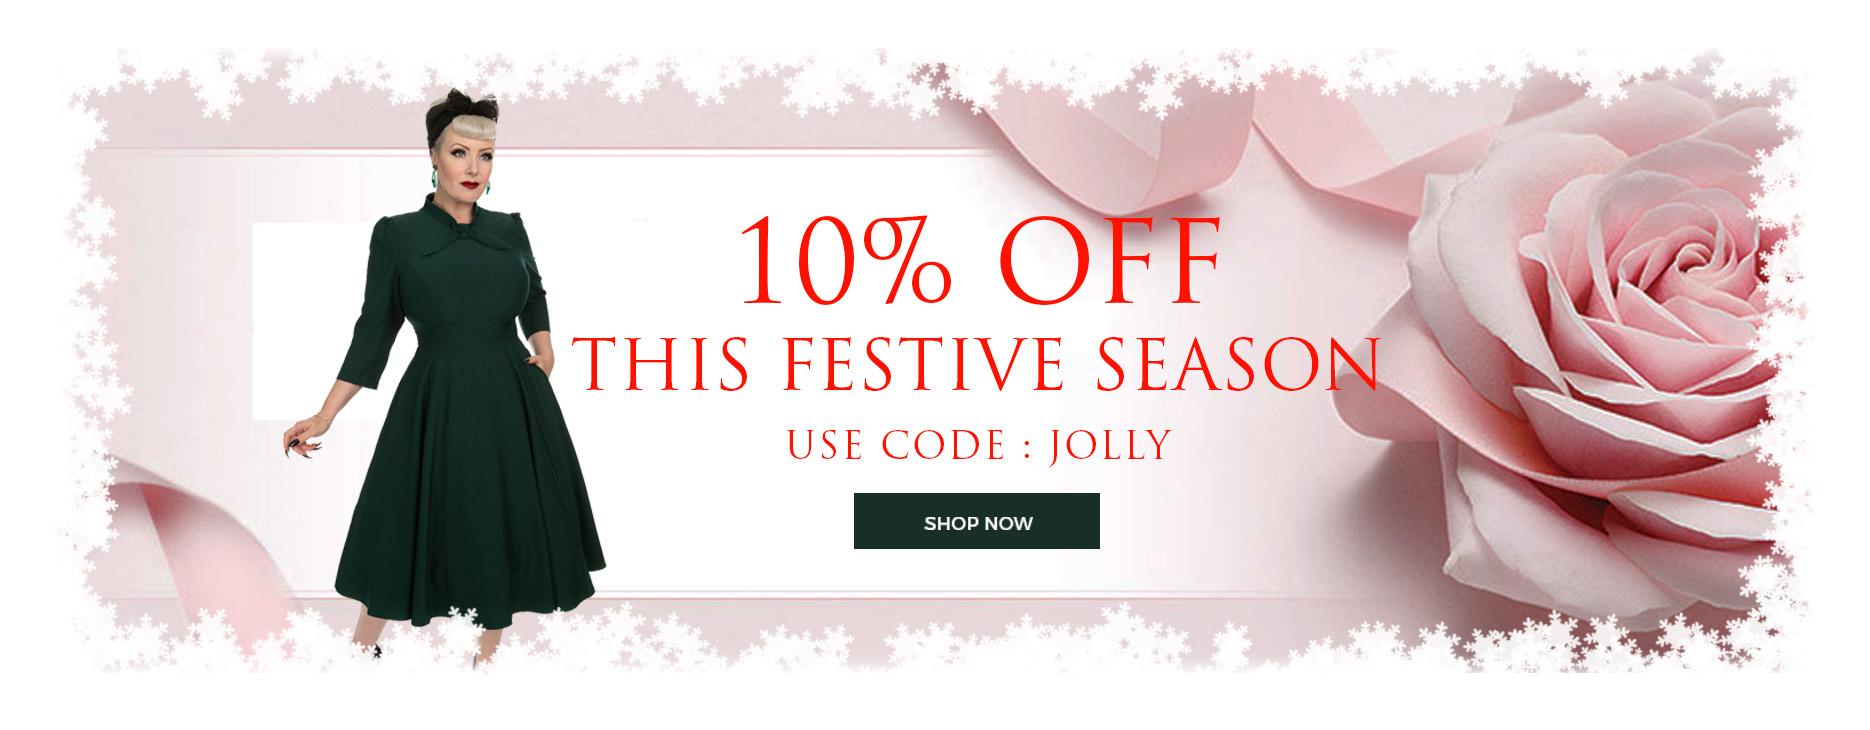 Christmas Discount Code